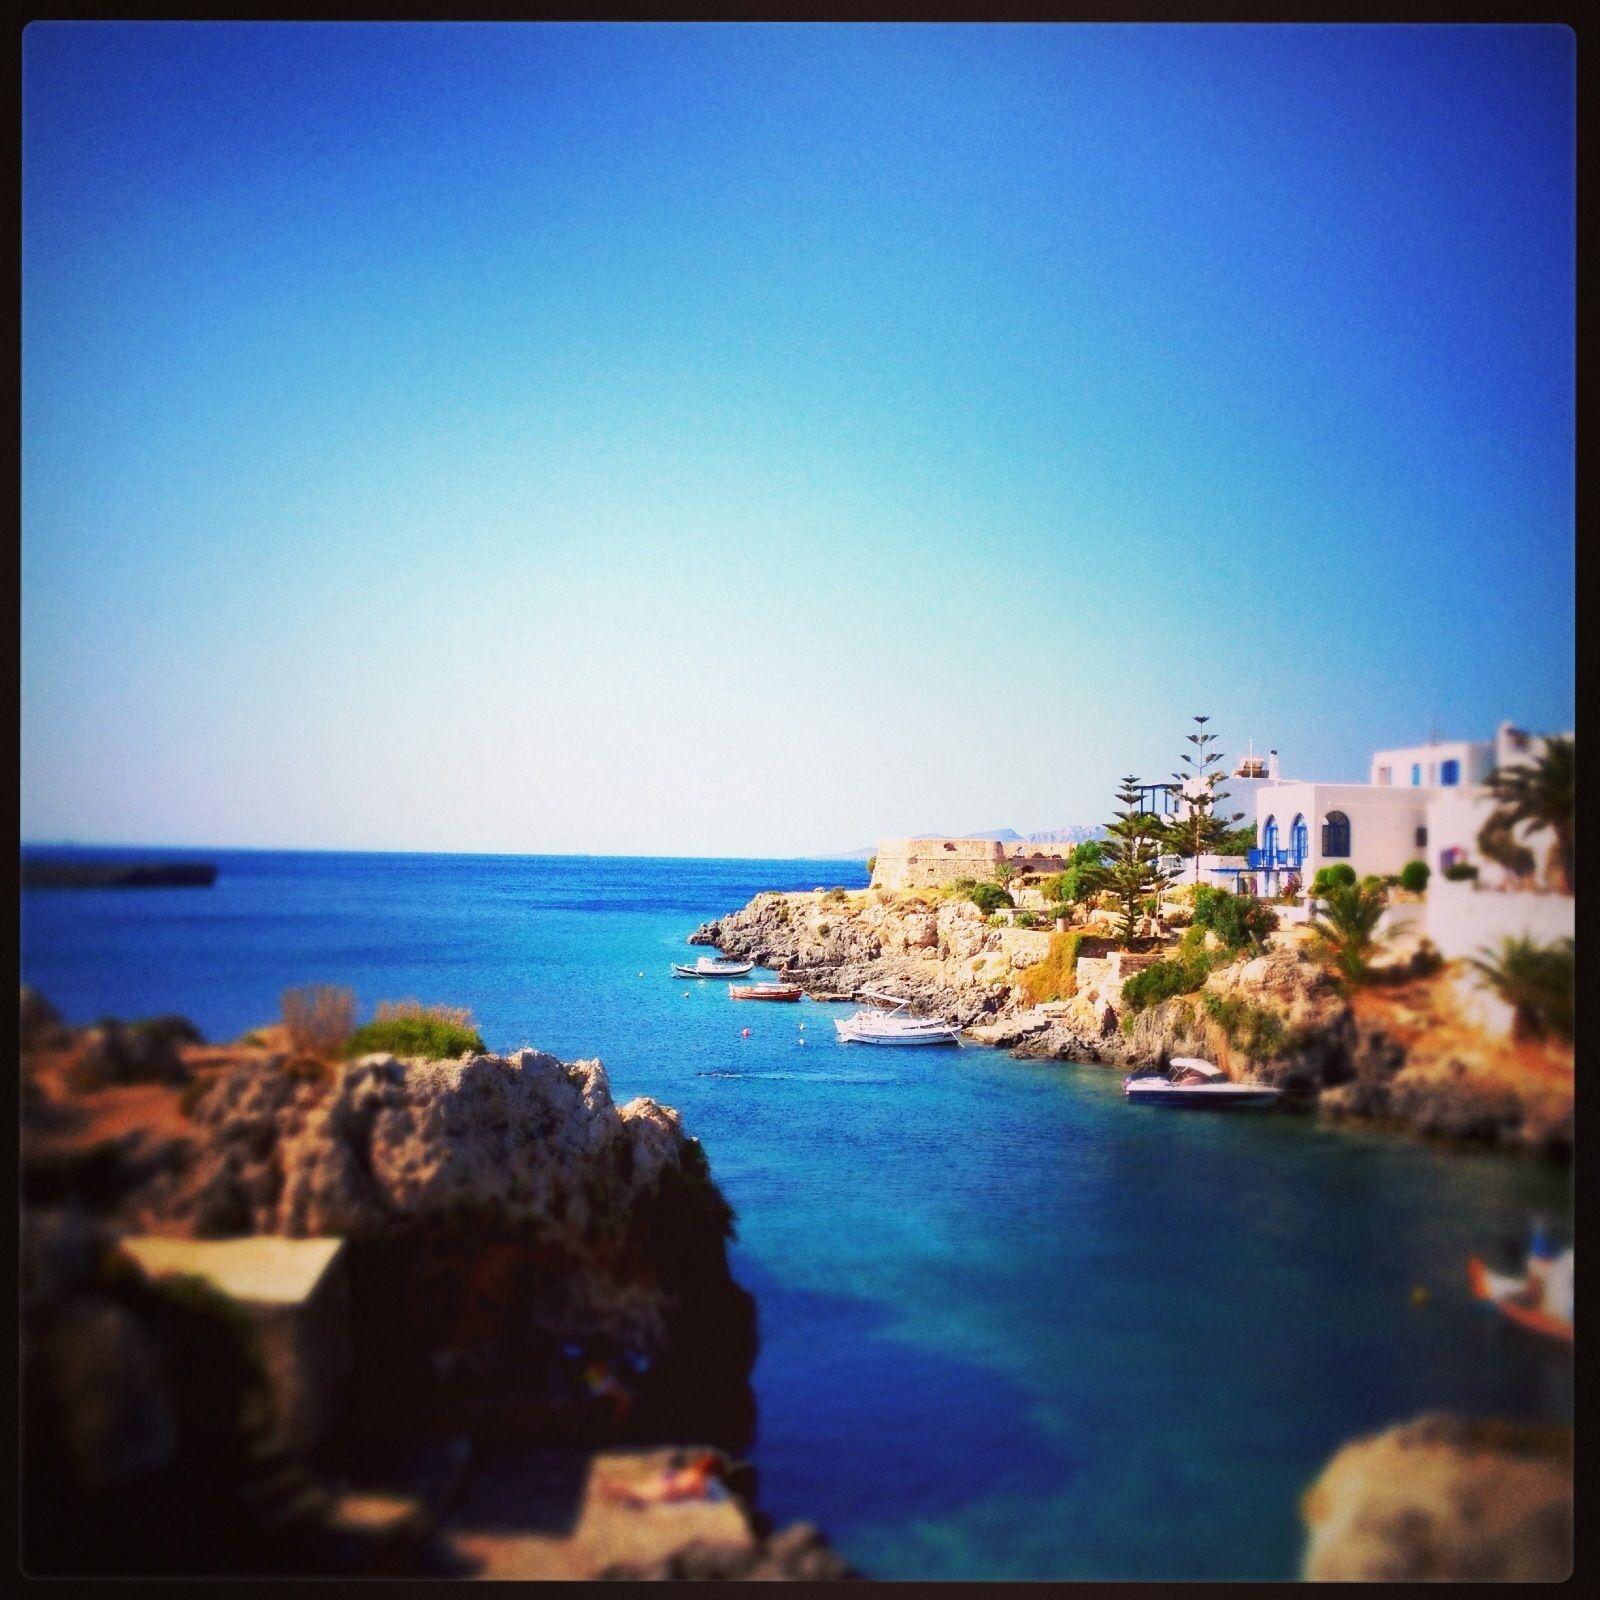 Kithara, Greece